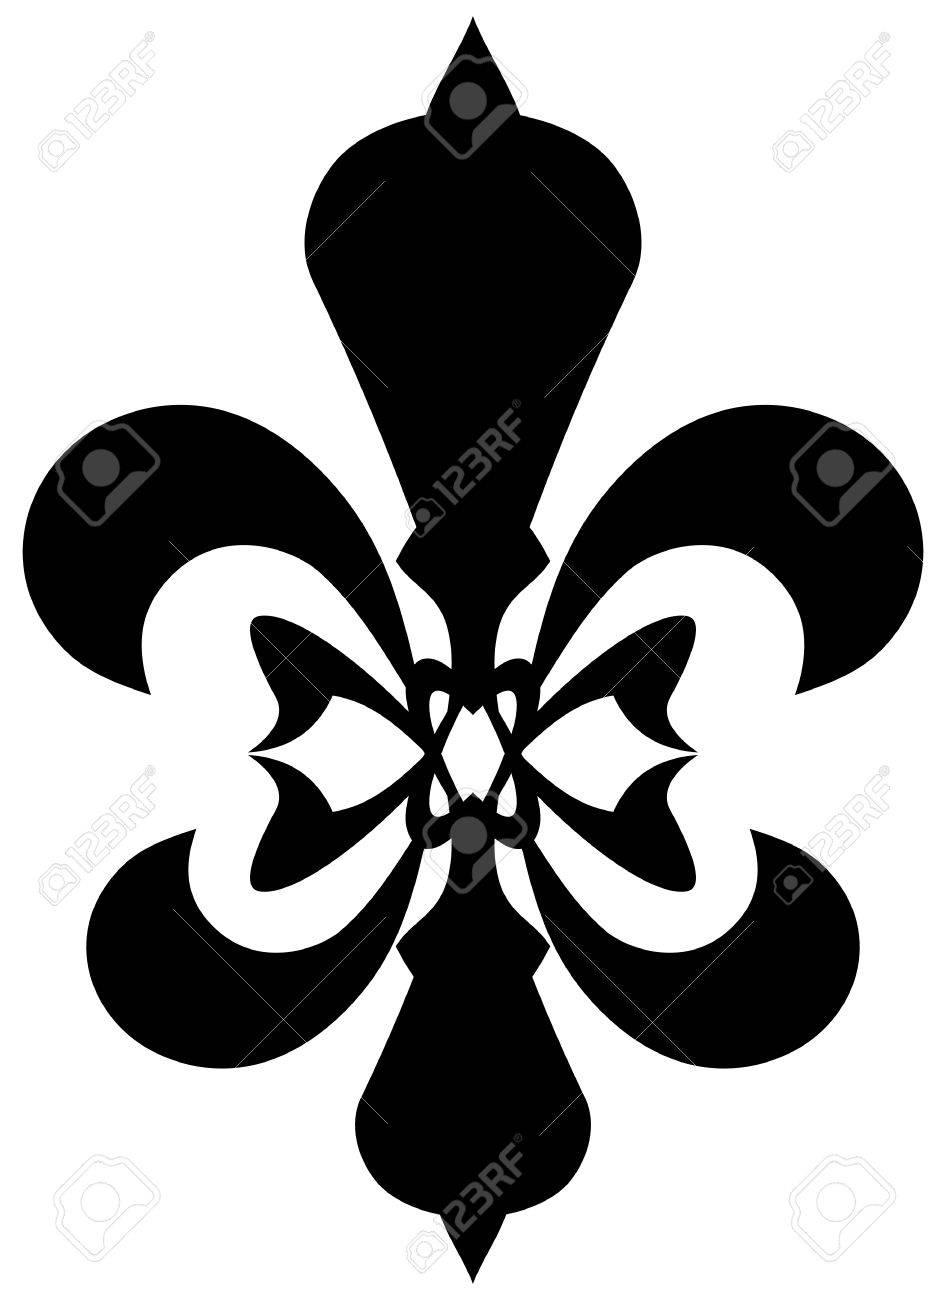 Fleur De Lis Symbol Black Silhouette Isolated On White Background